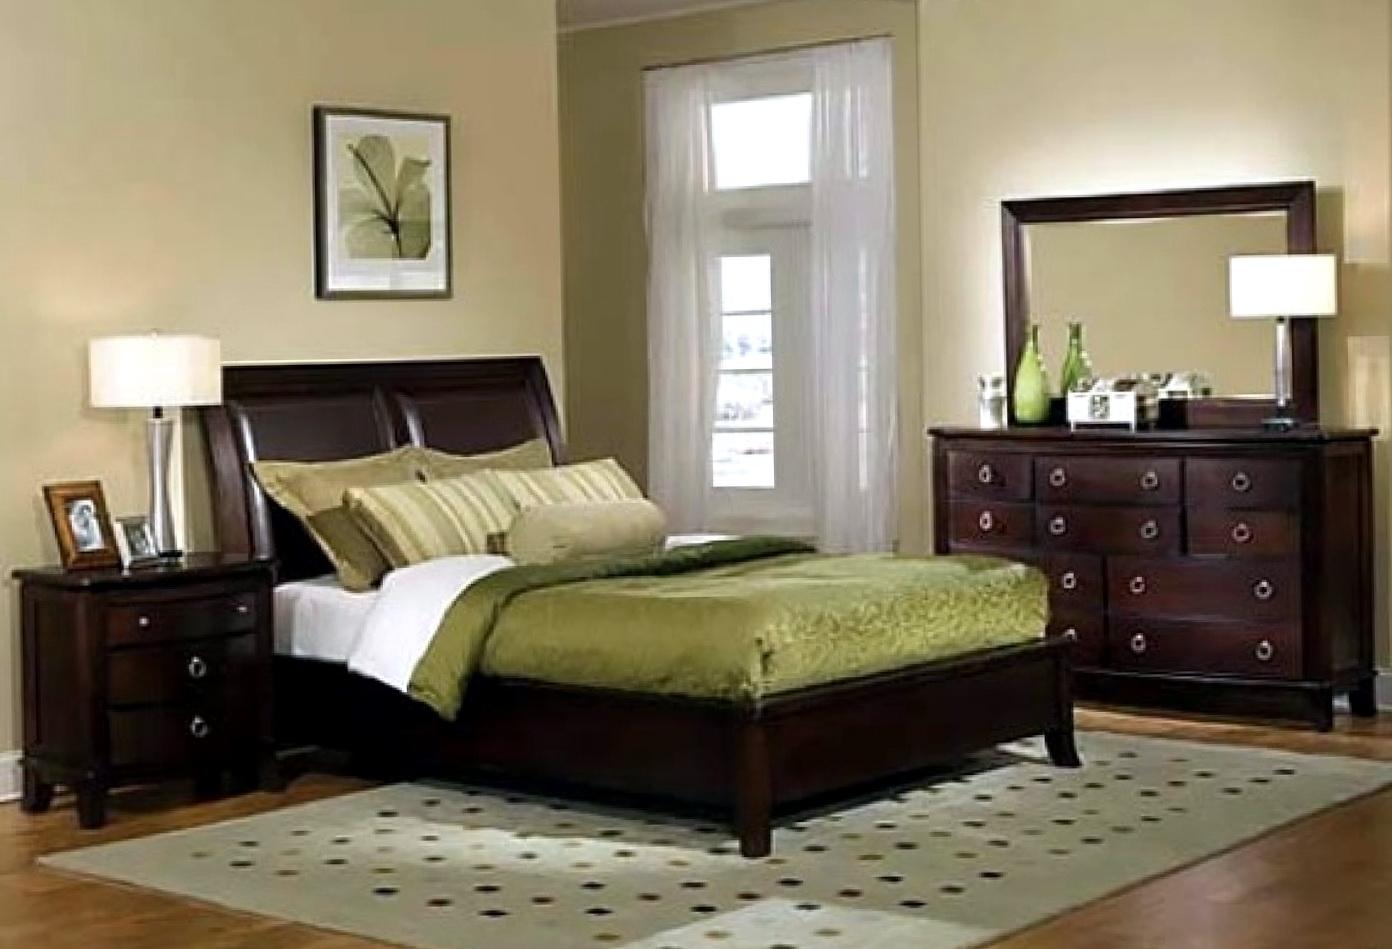 Best Color For Bedroom With Dark Furniture